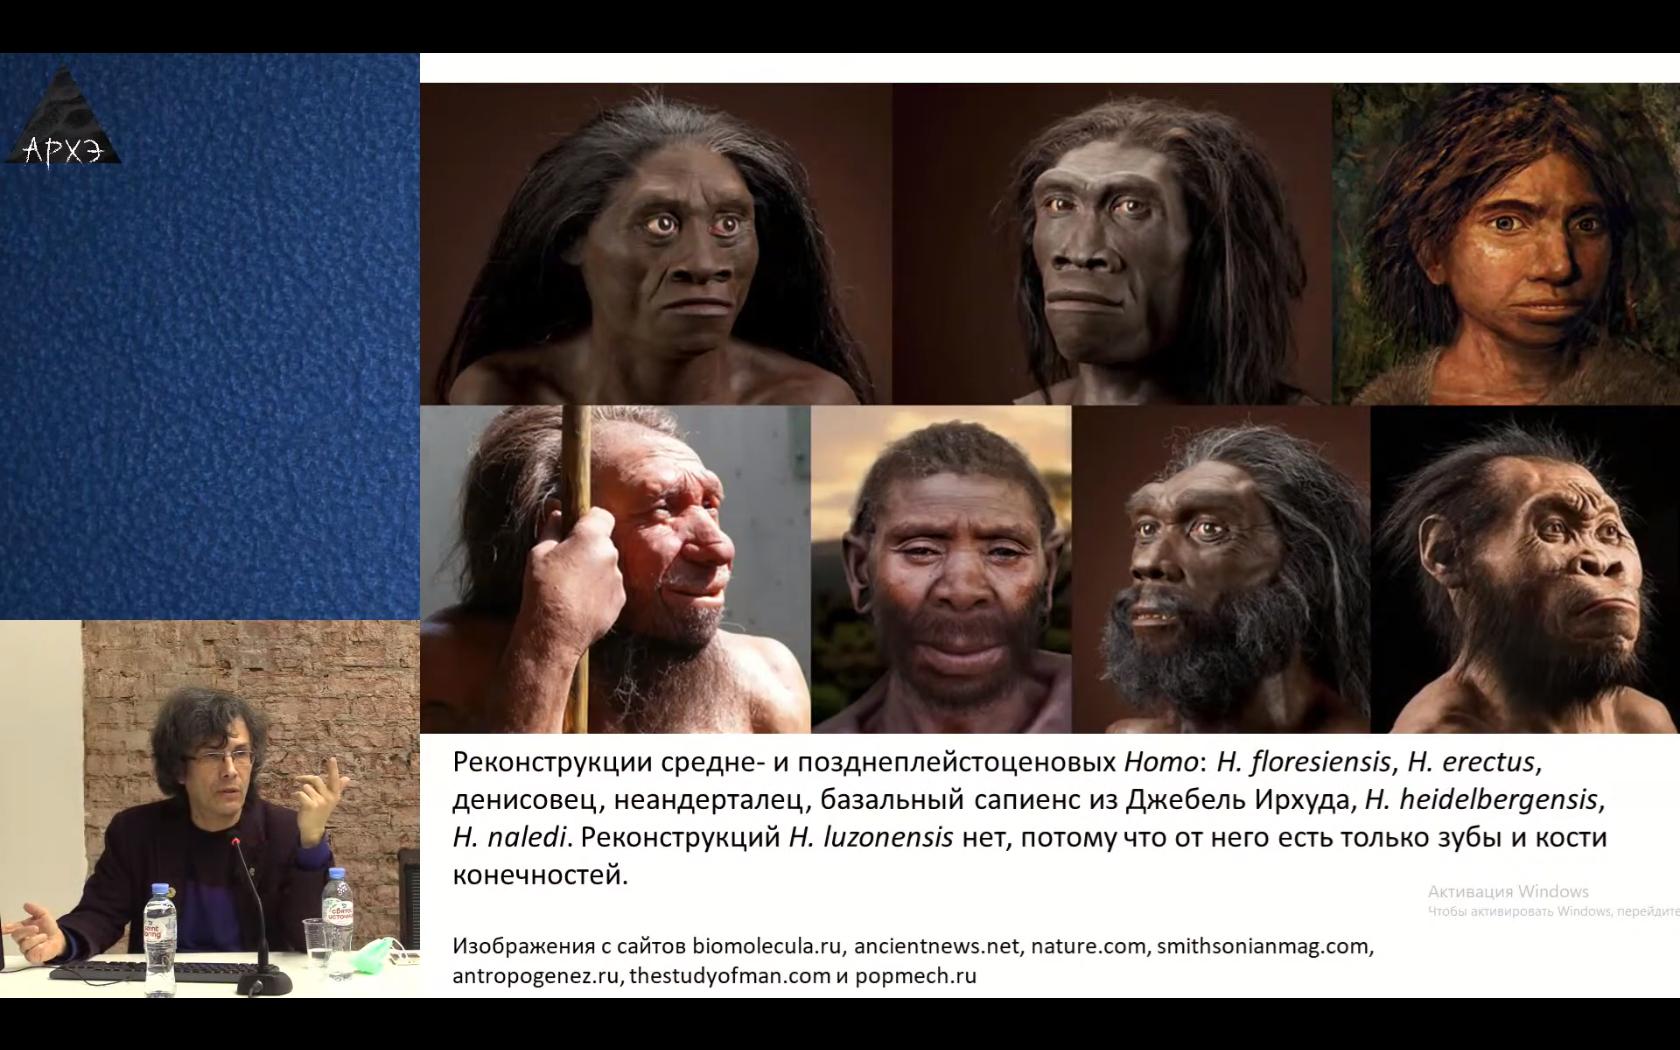 Проповеди об эволюции: интересности 2020 года